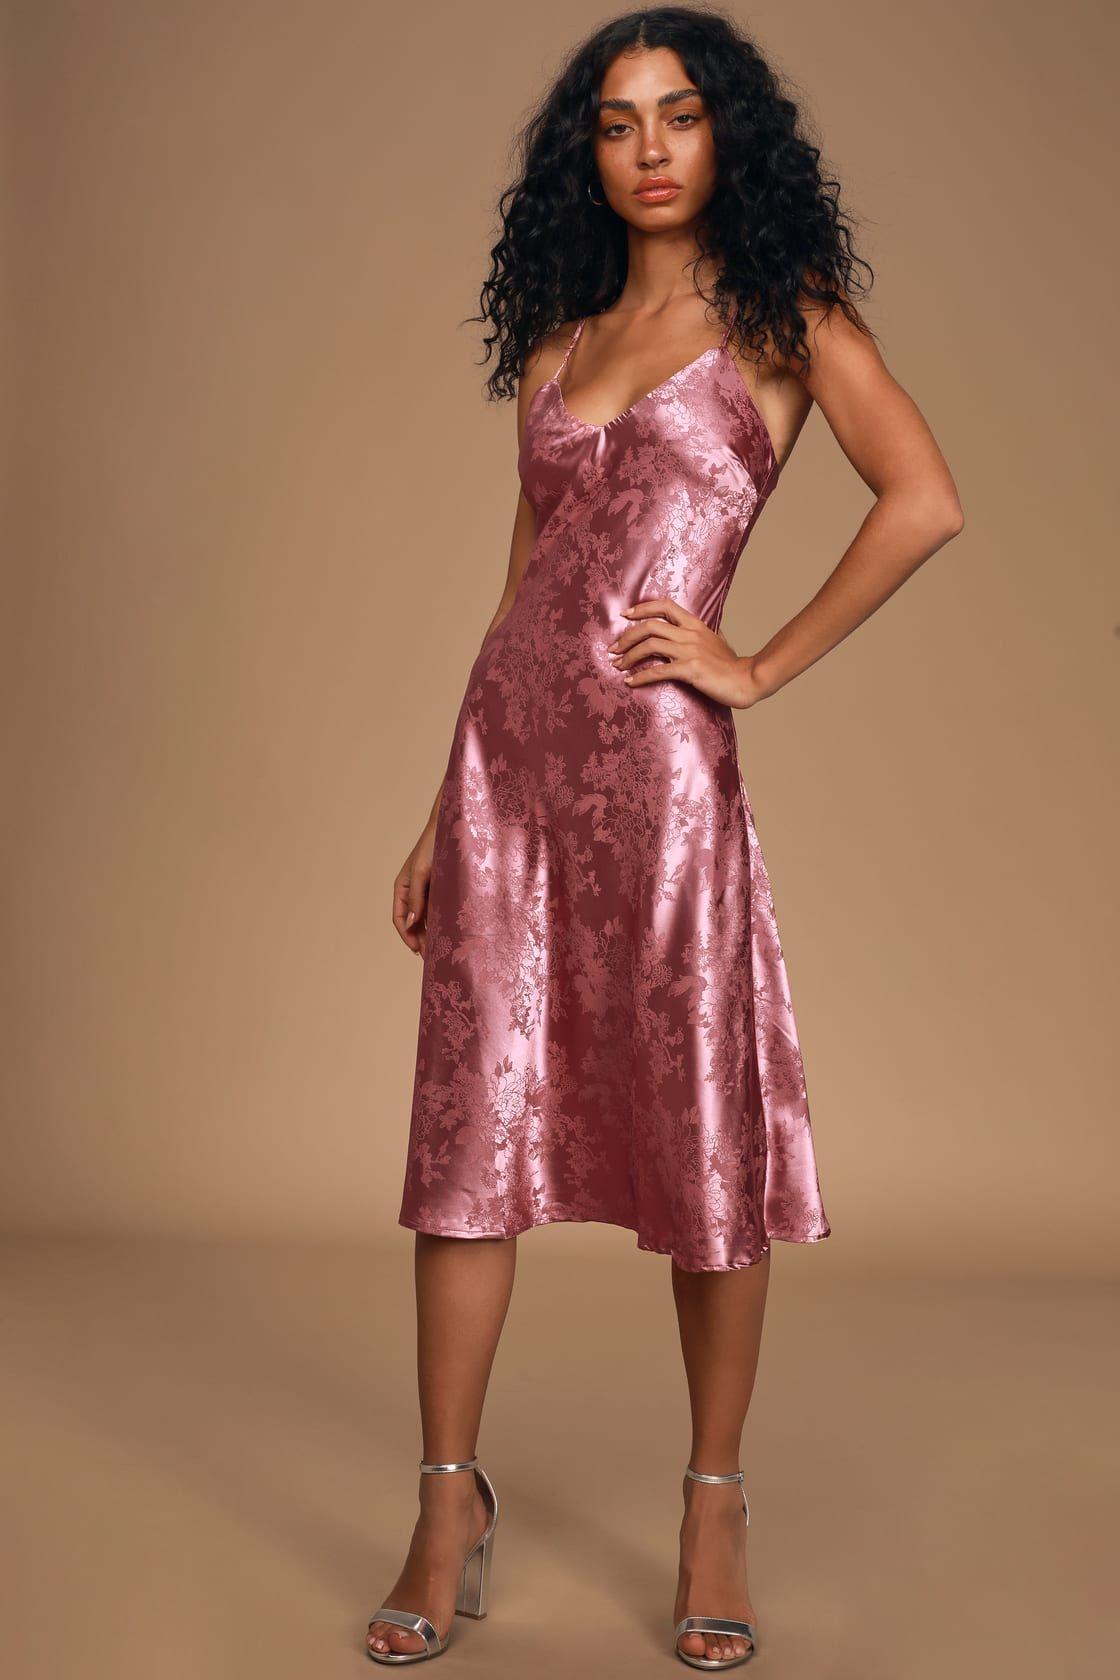 Calla love mauve pink jacquard satin slip dress in 2020